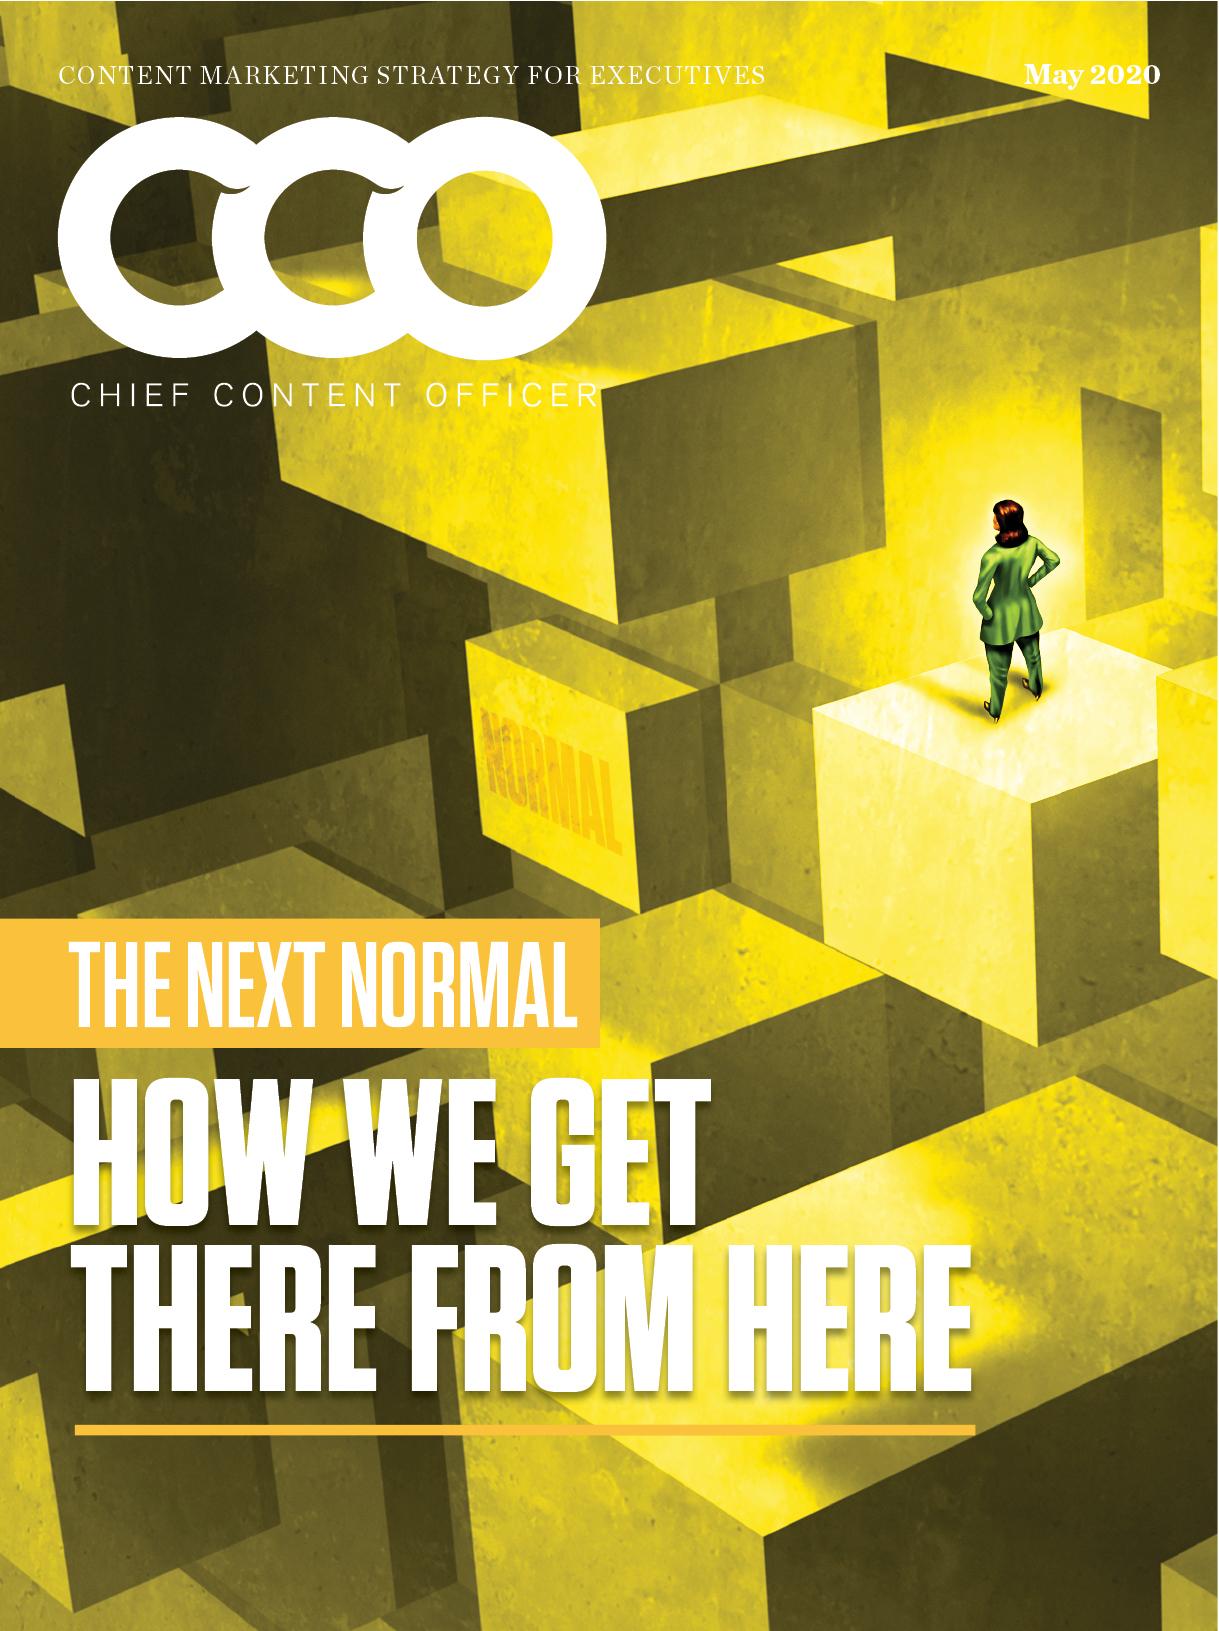 CCO_cover_image